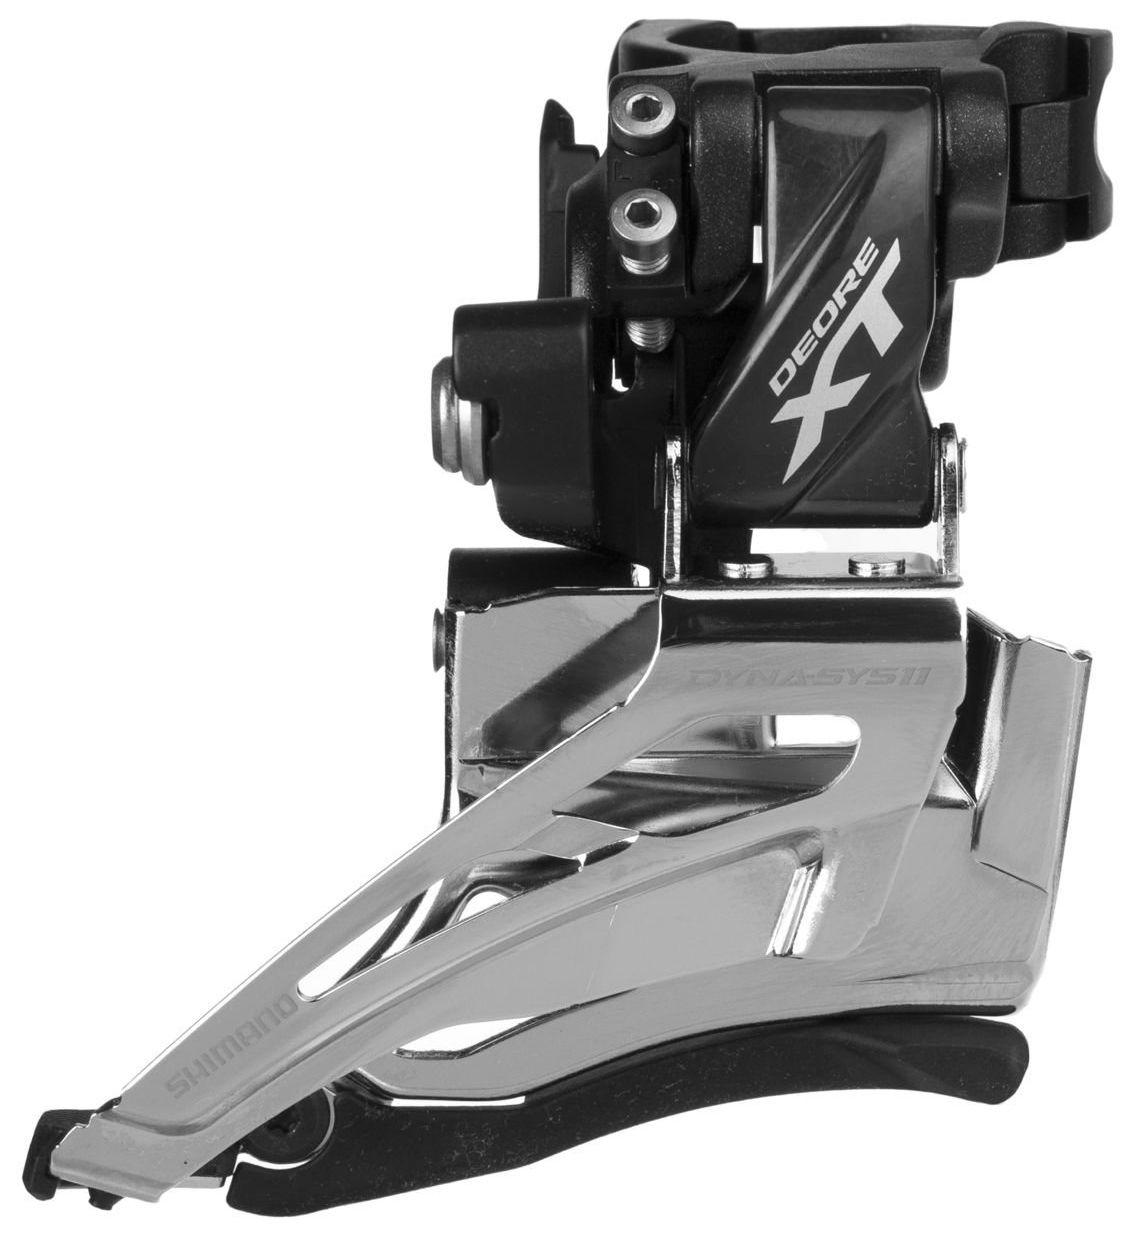 Запчасть Shimano XT M8025-H, для 2x11 (IFDM8025HX6) запчасть shimano xt m8000 h 3x11